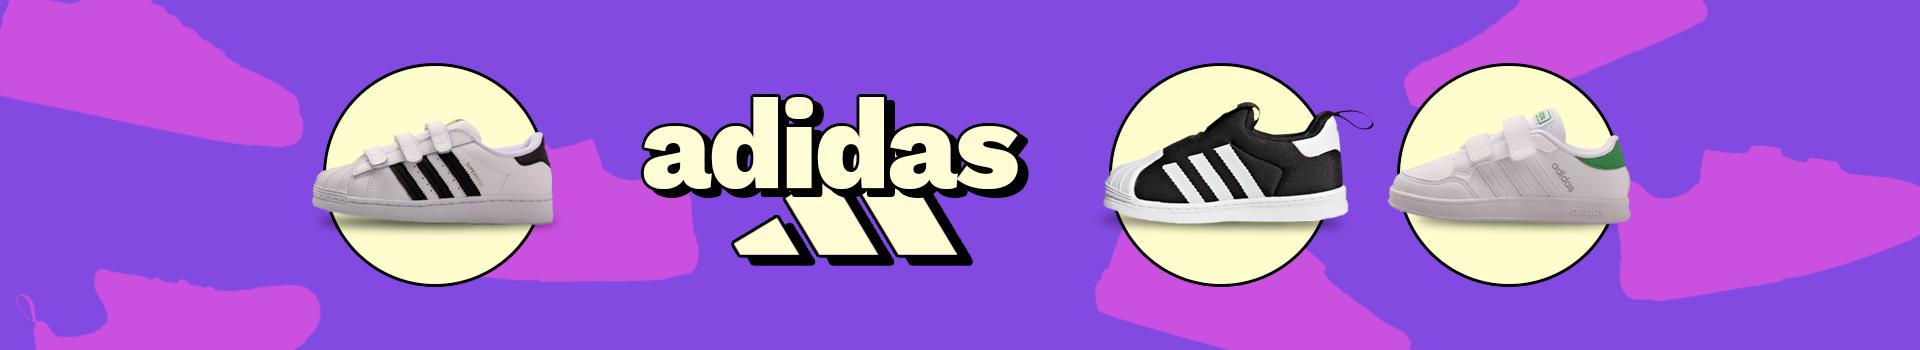 banner adidas